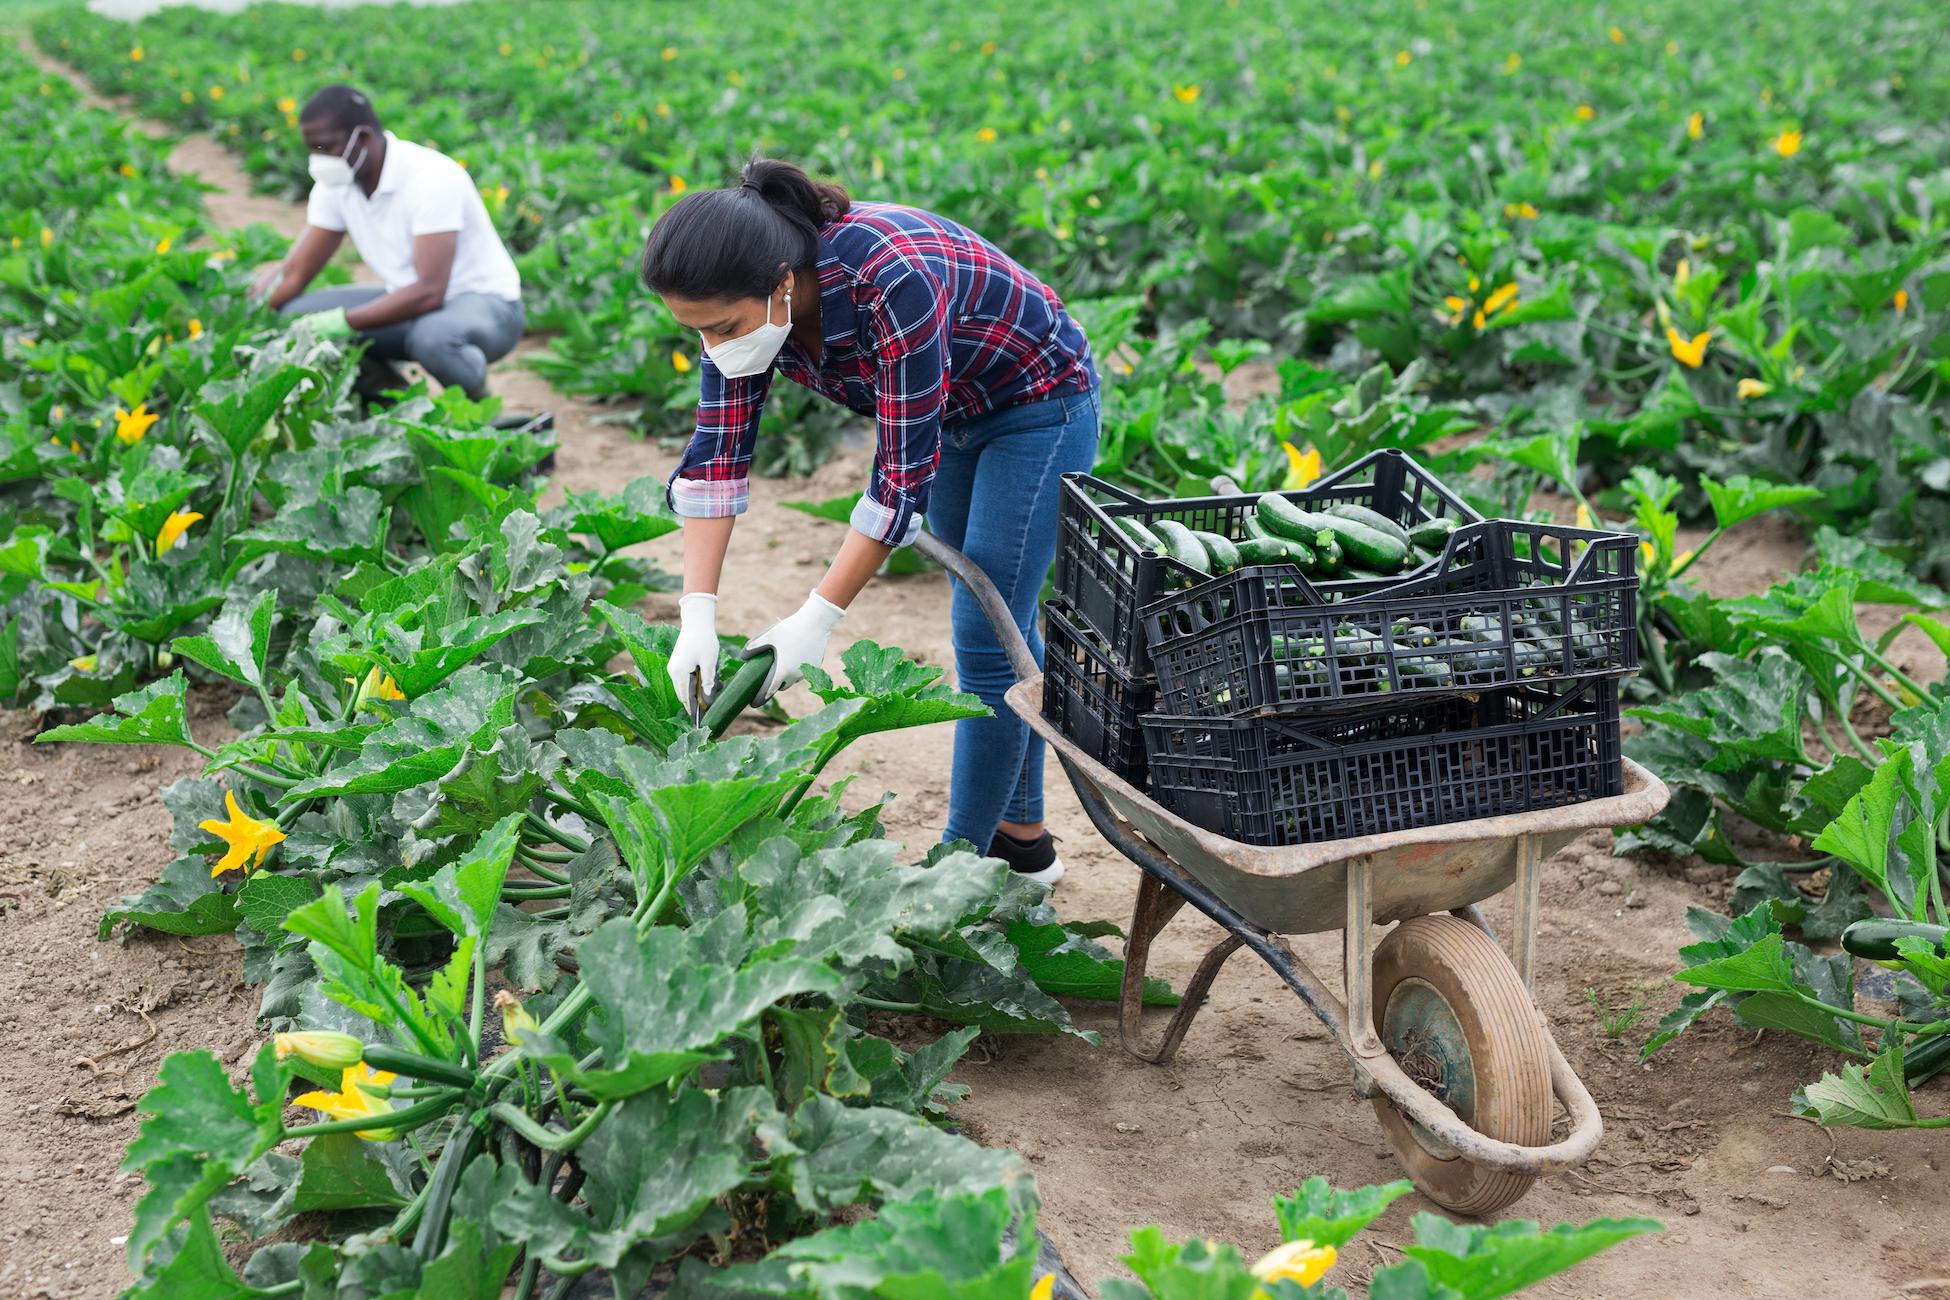 Farmworkers harvesting zucchini